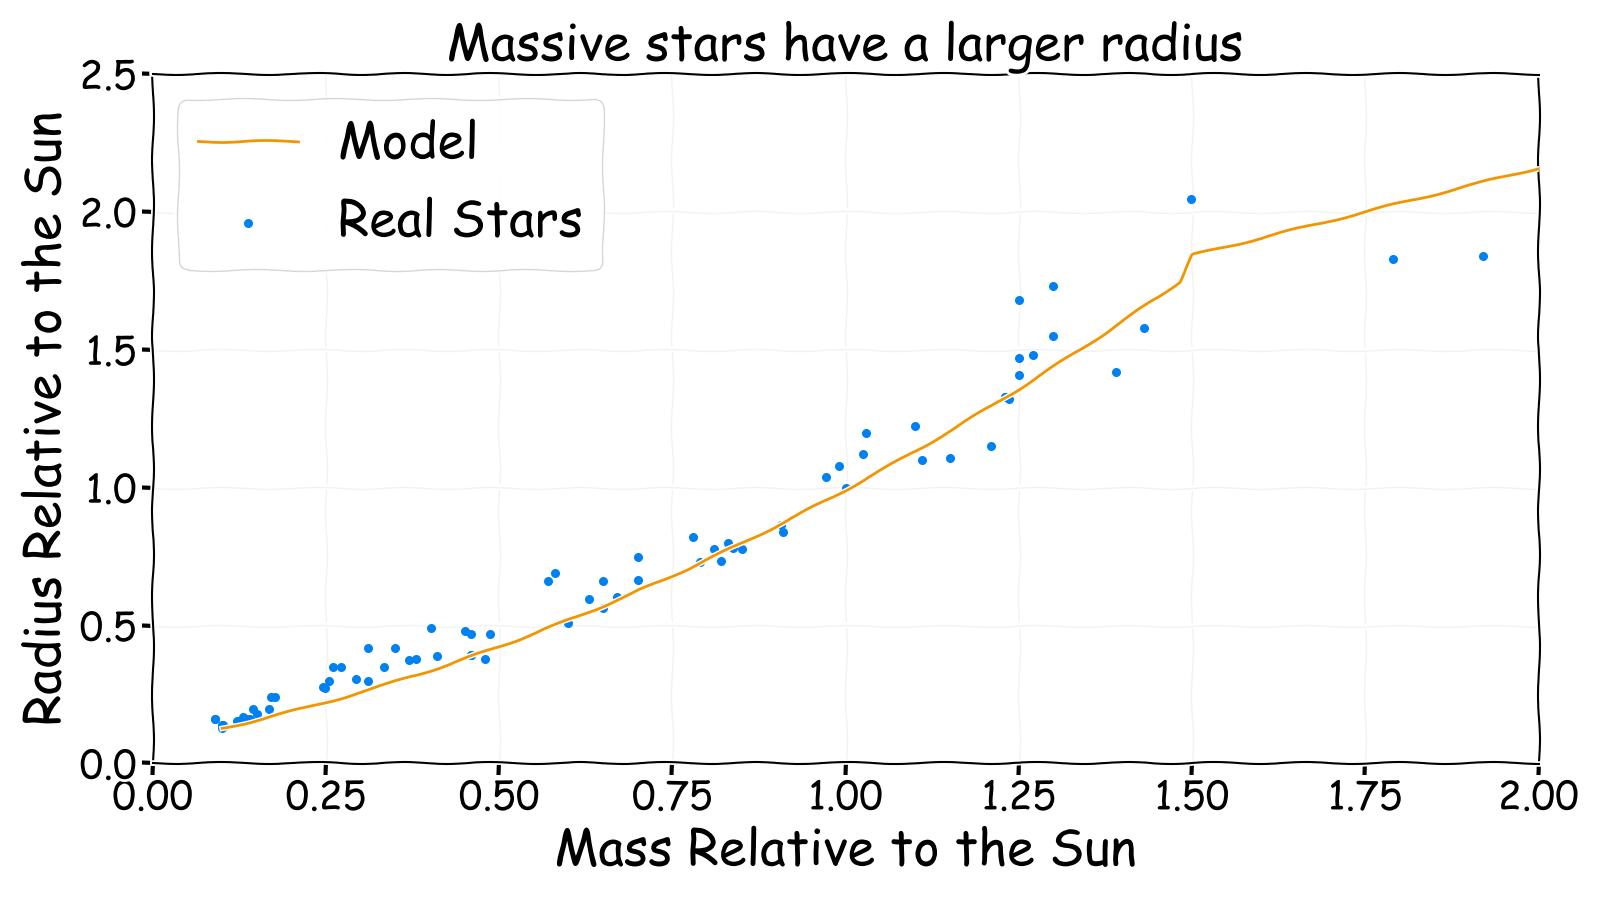 Massive stars have a larger radius